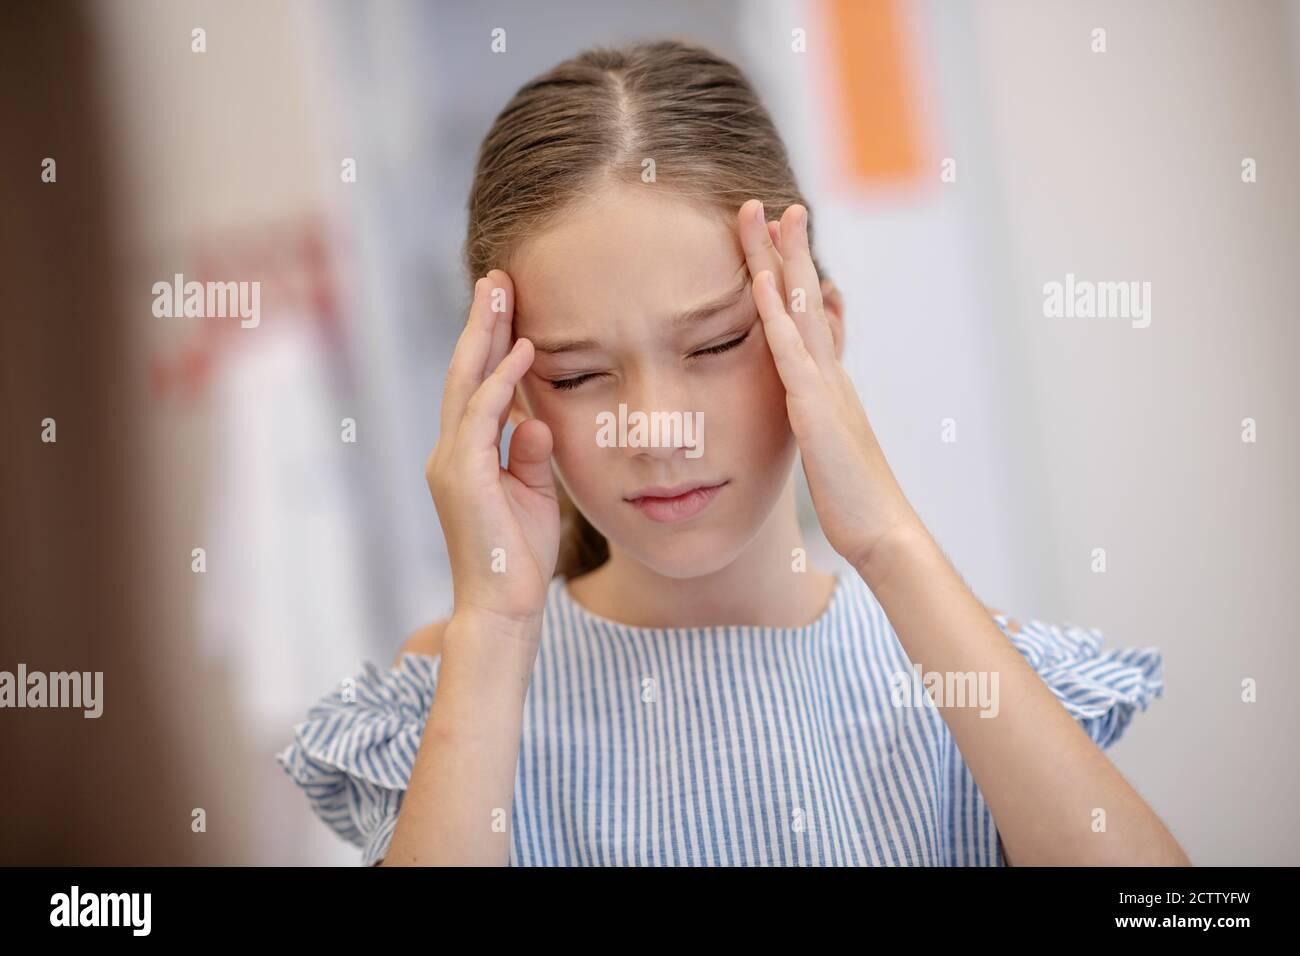 Girl having a headache and looking unhappy Stock Photo